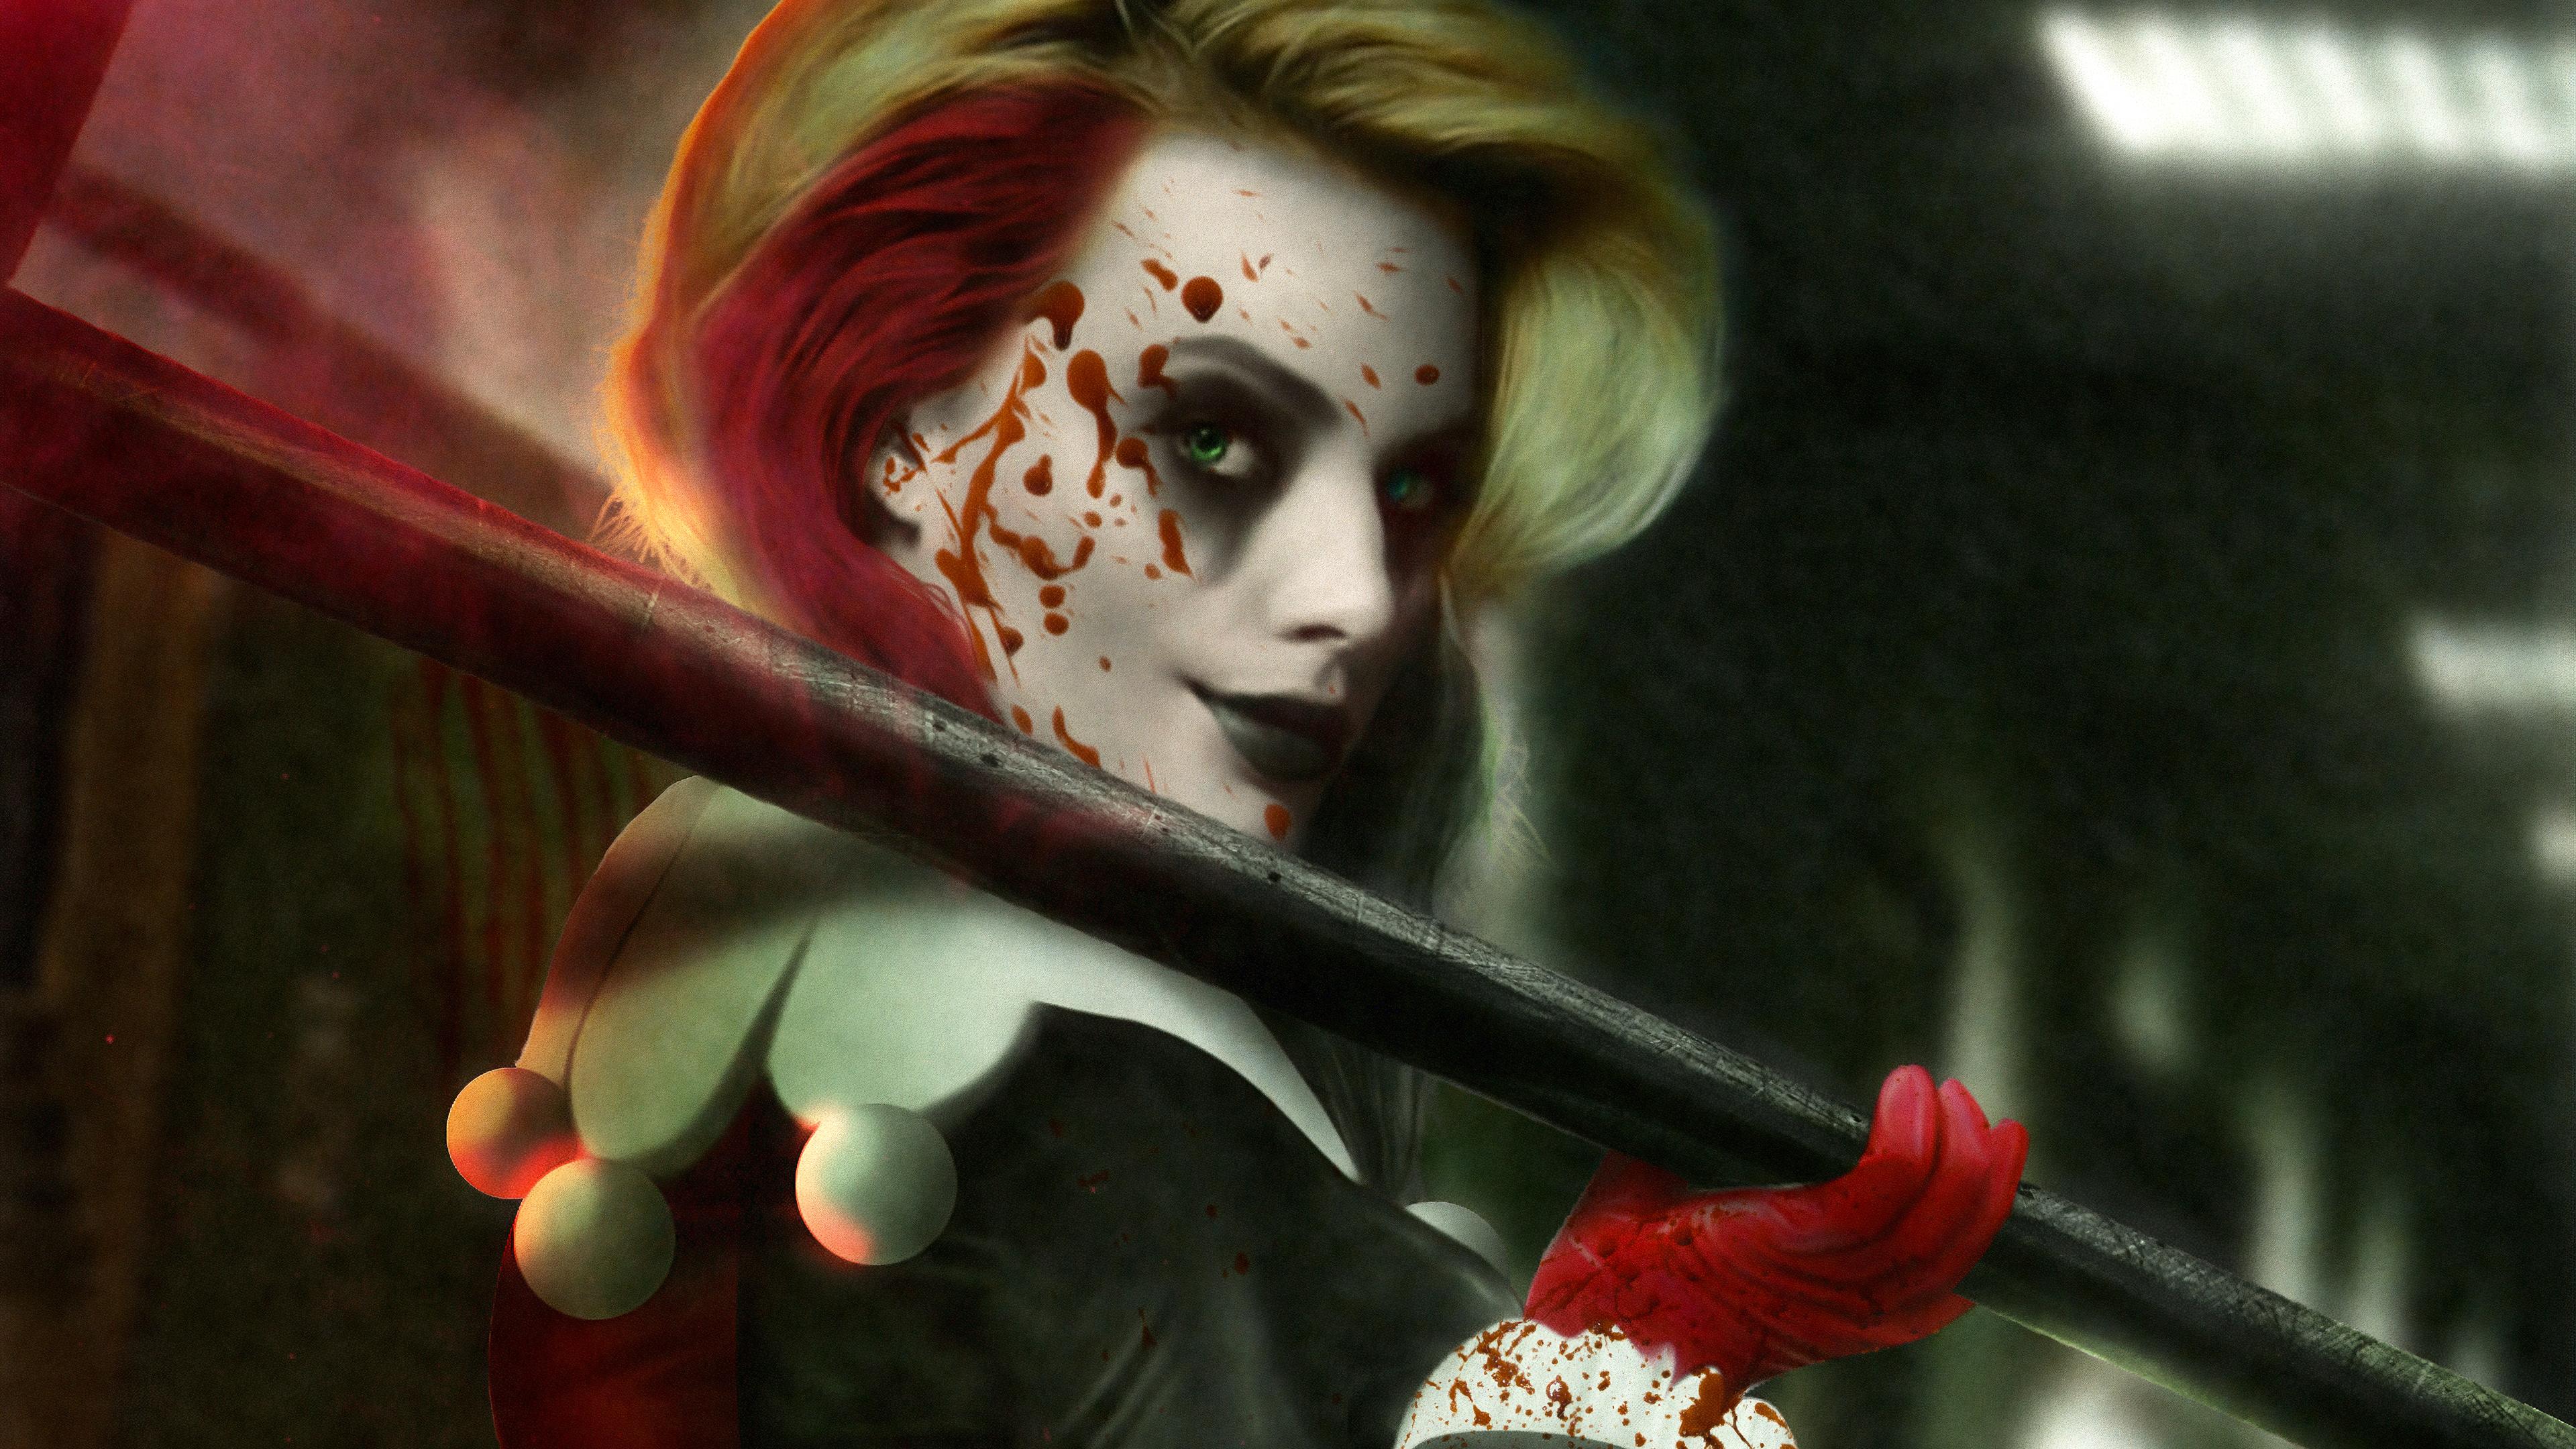 harley quinn the blood queen 1562105998 - Harley Quinn The Blood Queen - supervillain wallpapers, hd-wallpapers, harley quinn wallpapers, 4k-wallpapers